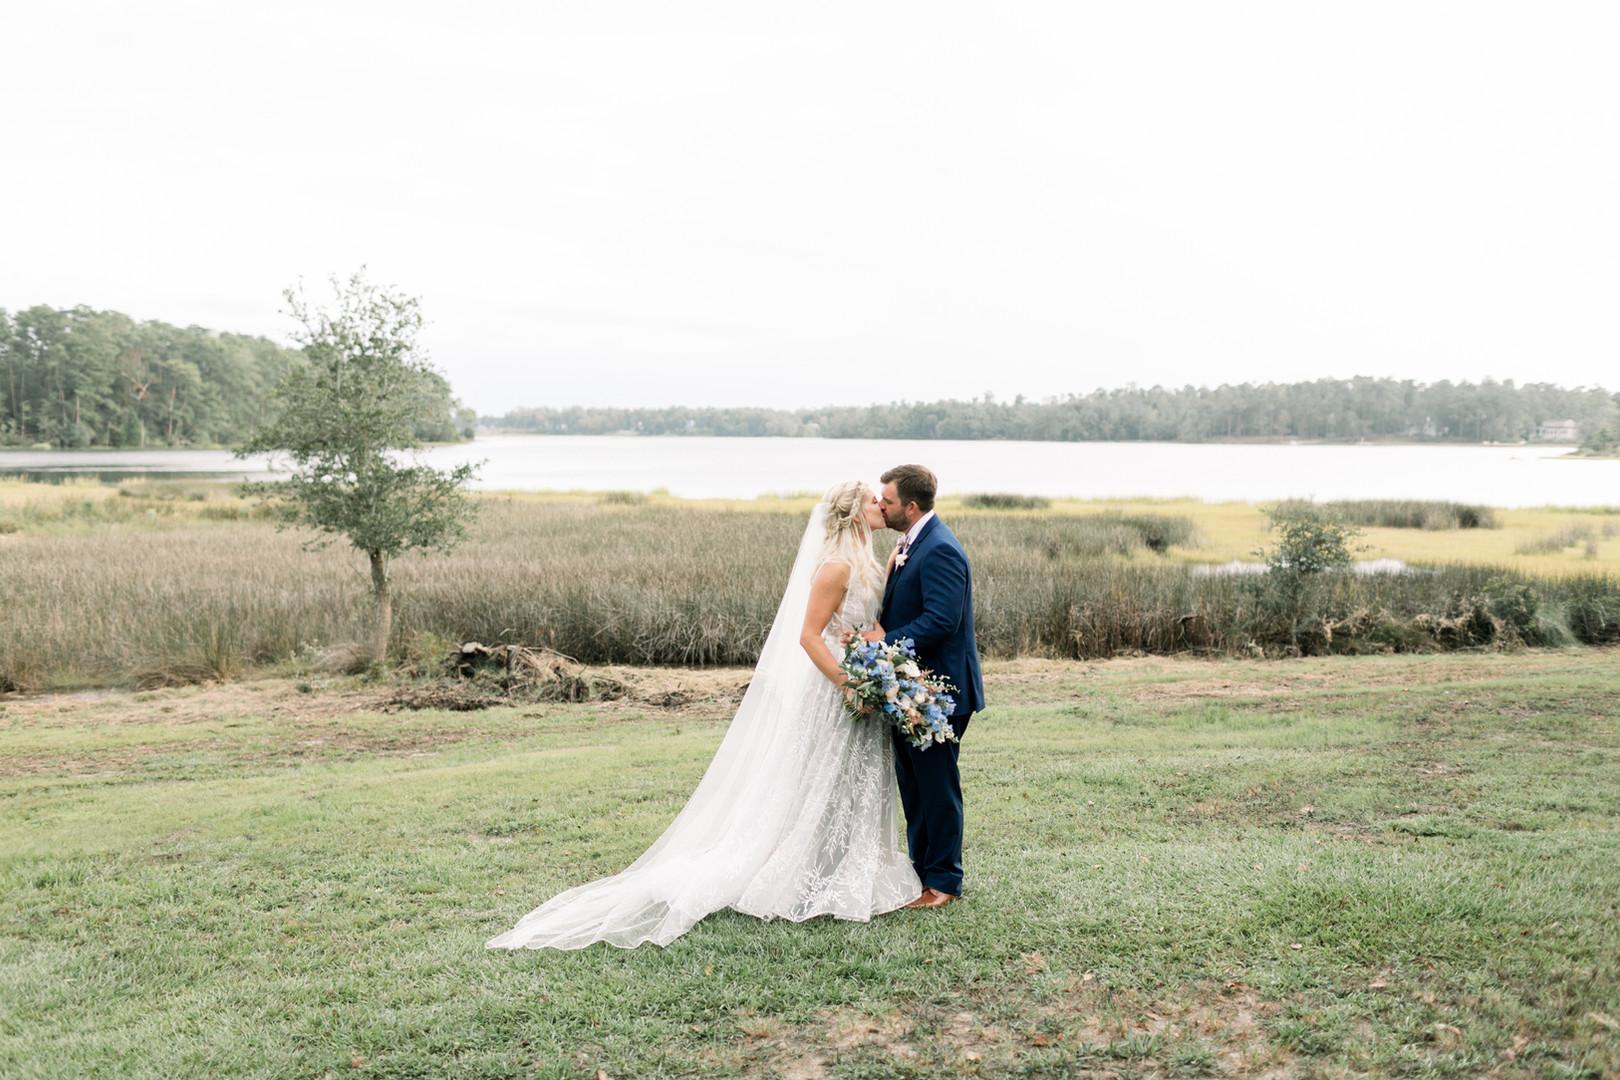 Erin&Cameron_Hampstead,NCWedding_ErinL.T